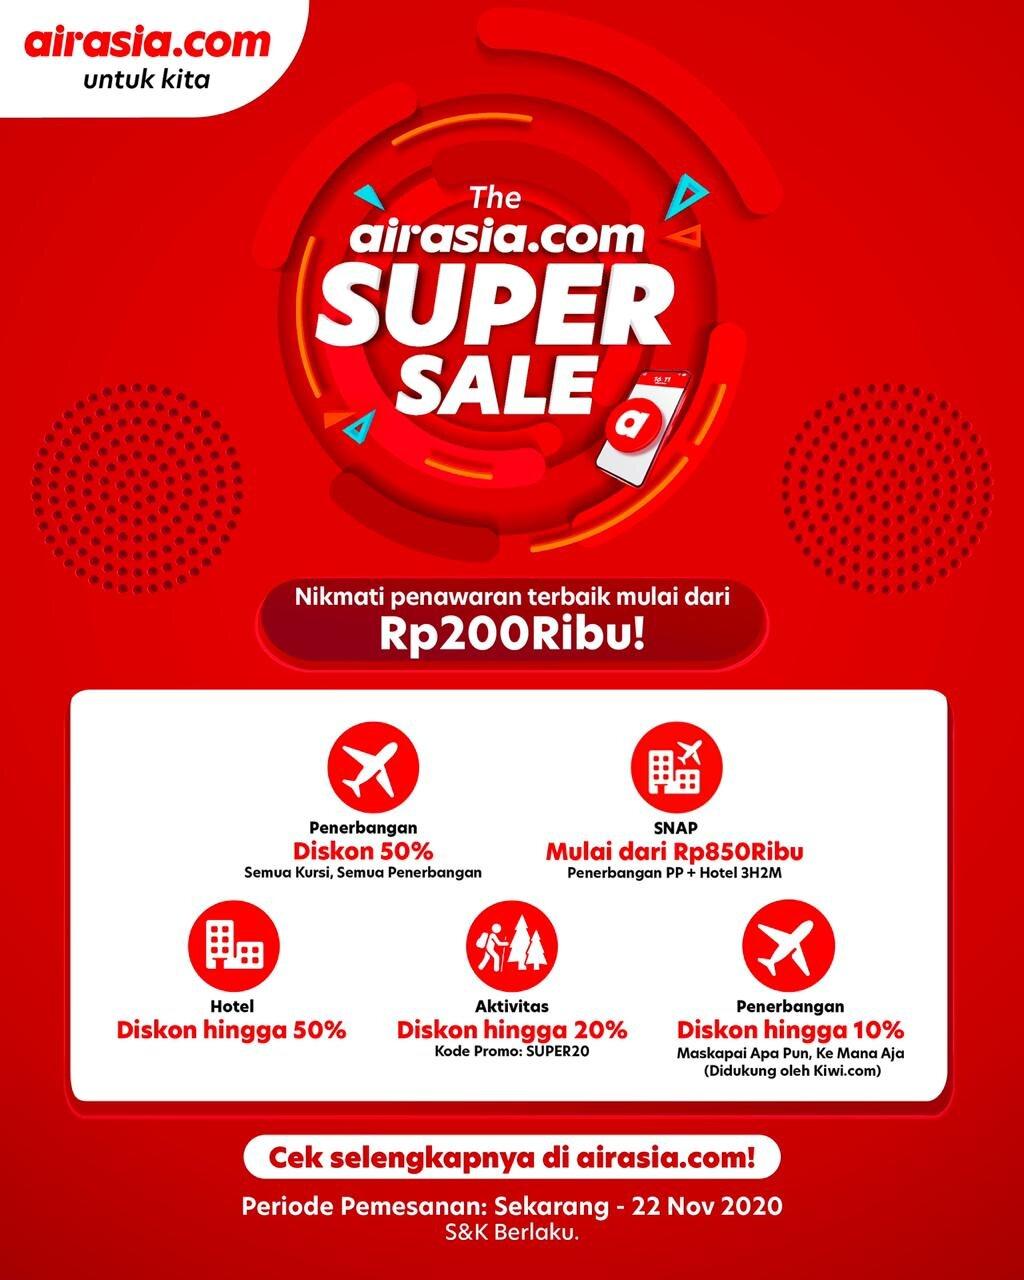 The Airasia Com Super Sale Hadir Kembali Tawarkan Diskon Hingga 50 Airasia Newsroom